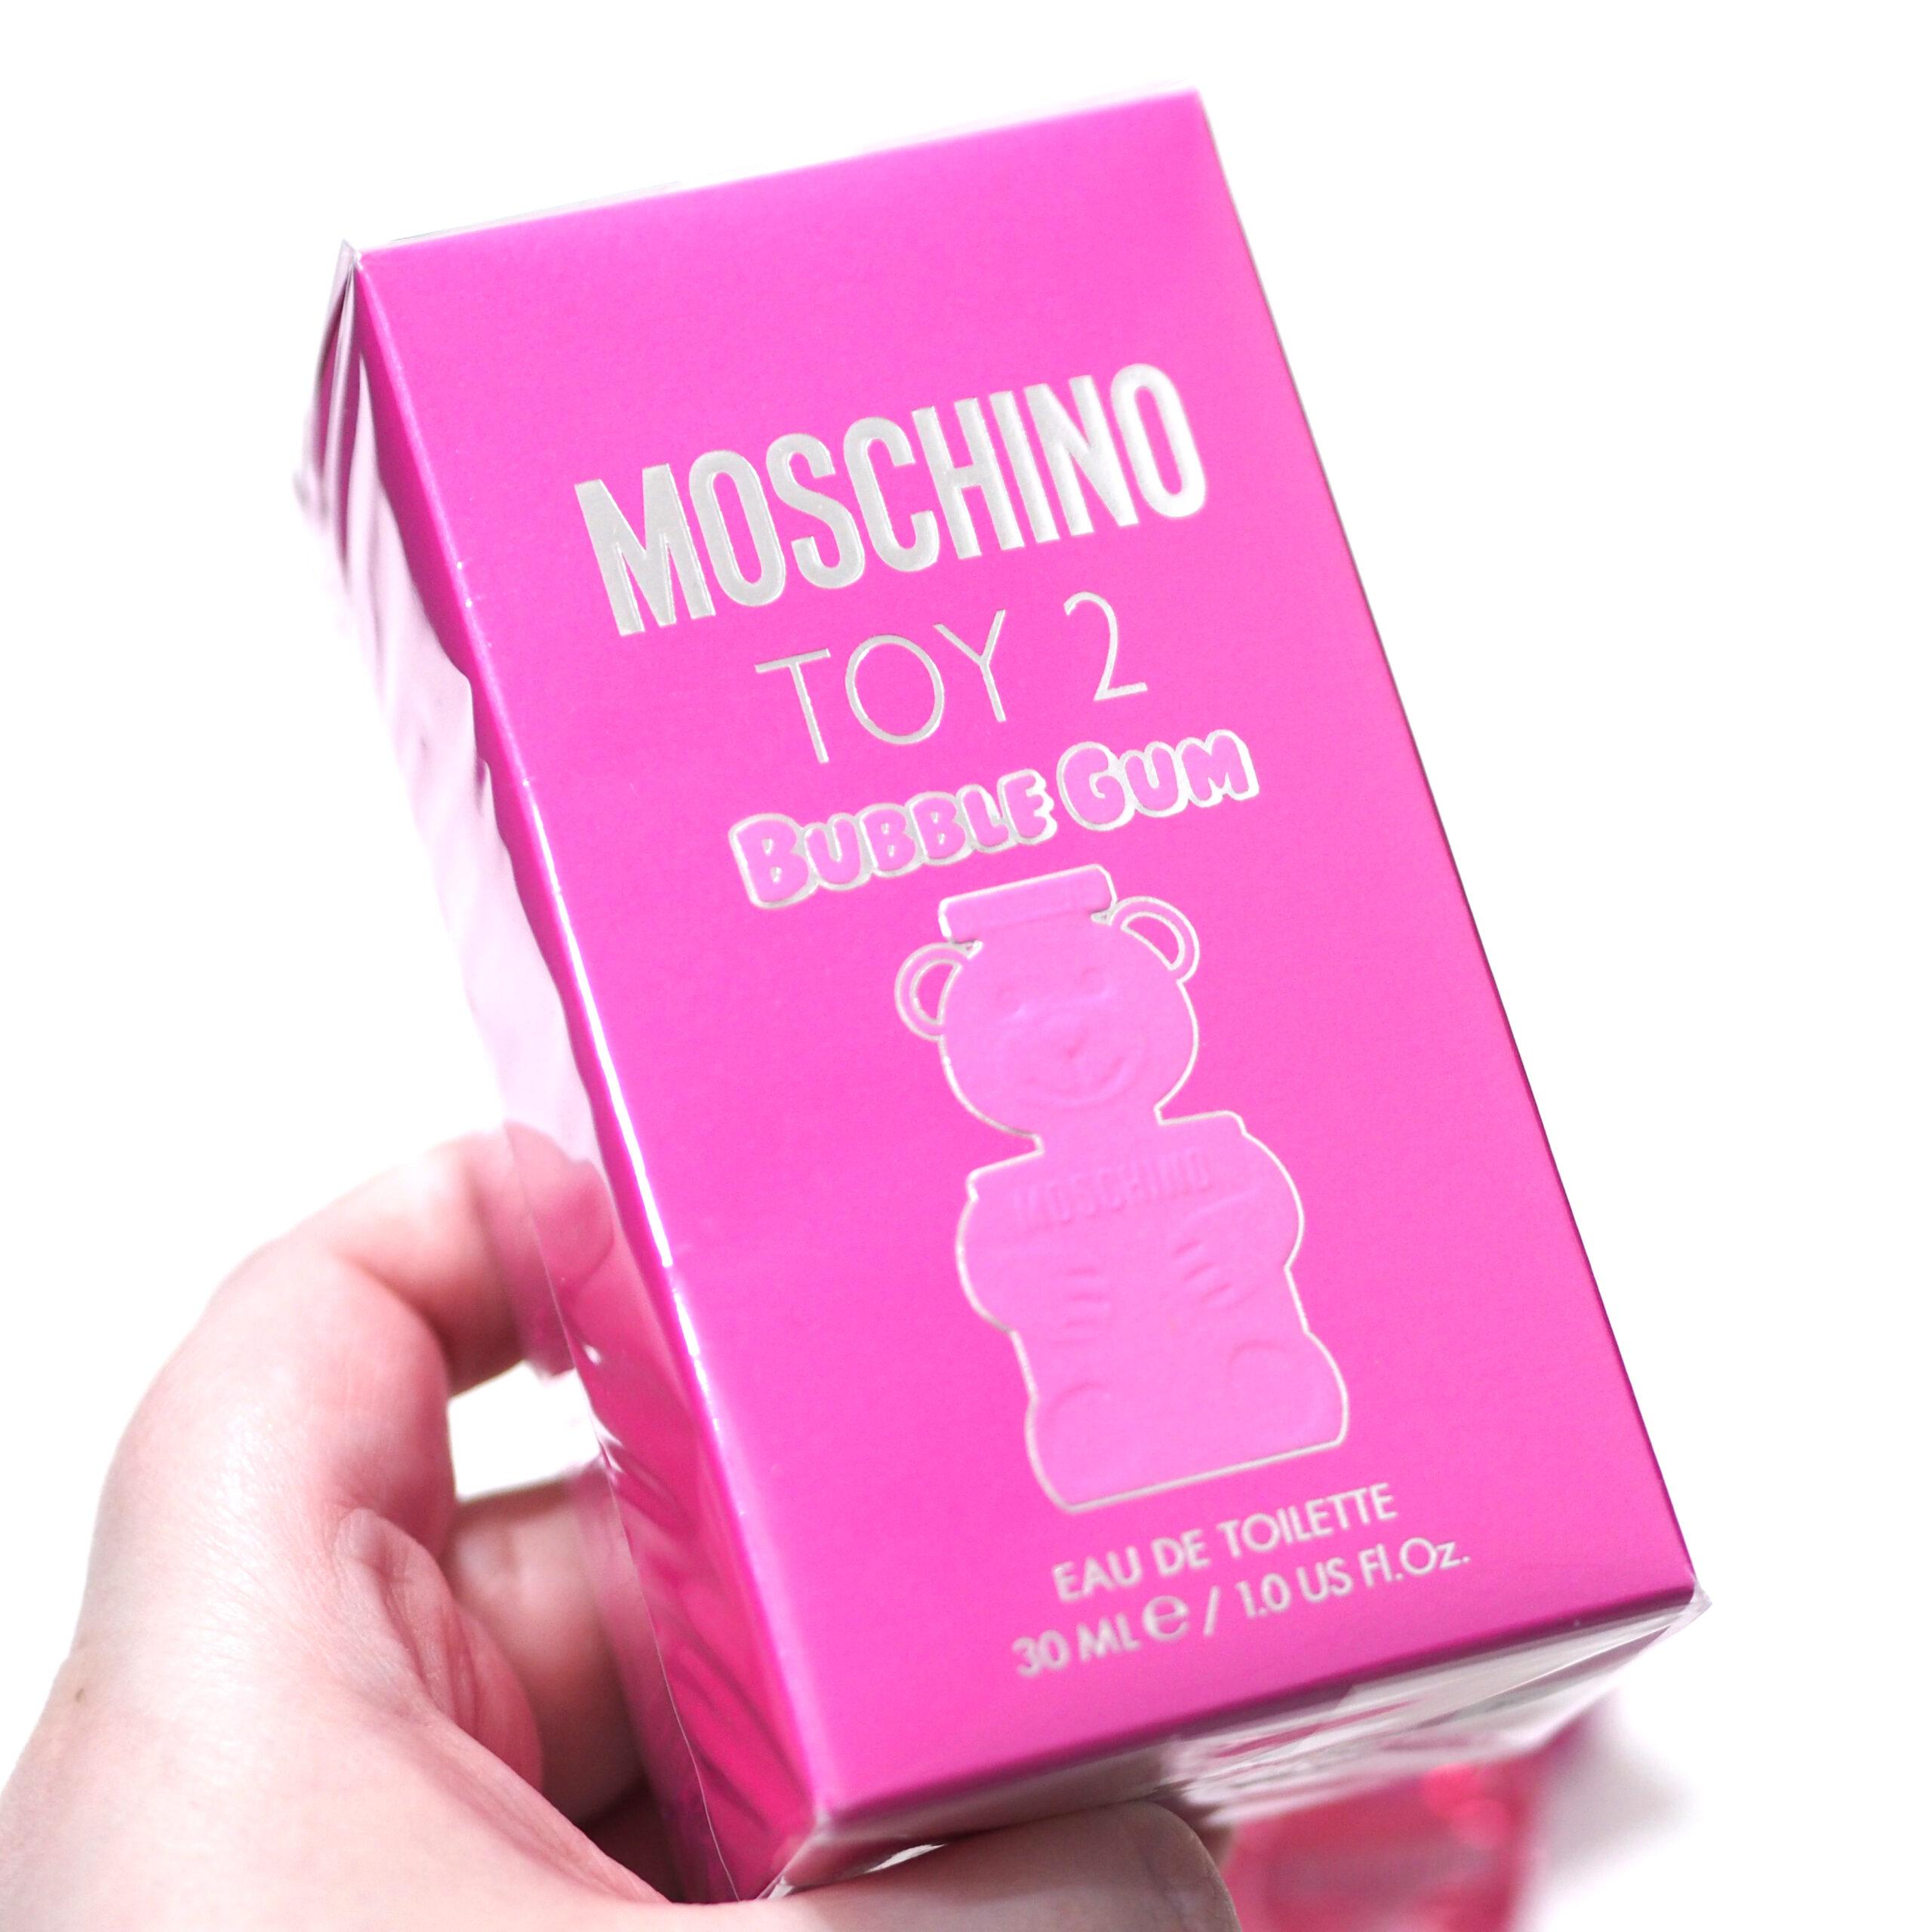 Moschino Toy 2 Bubblegum Eau de Toilette